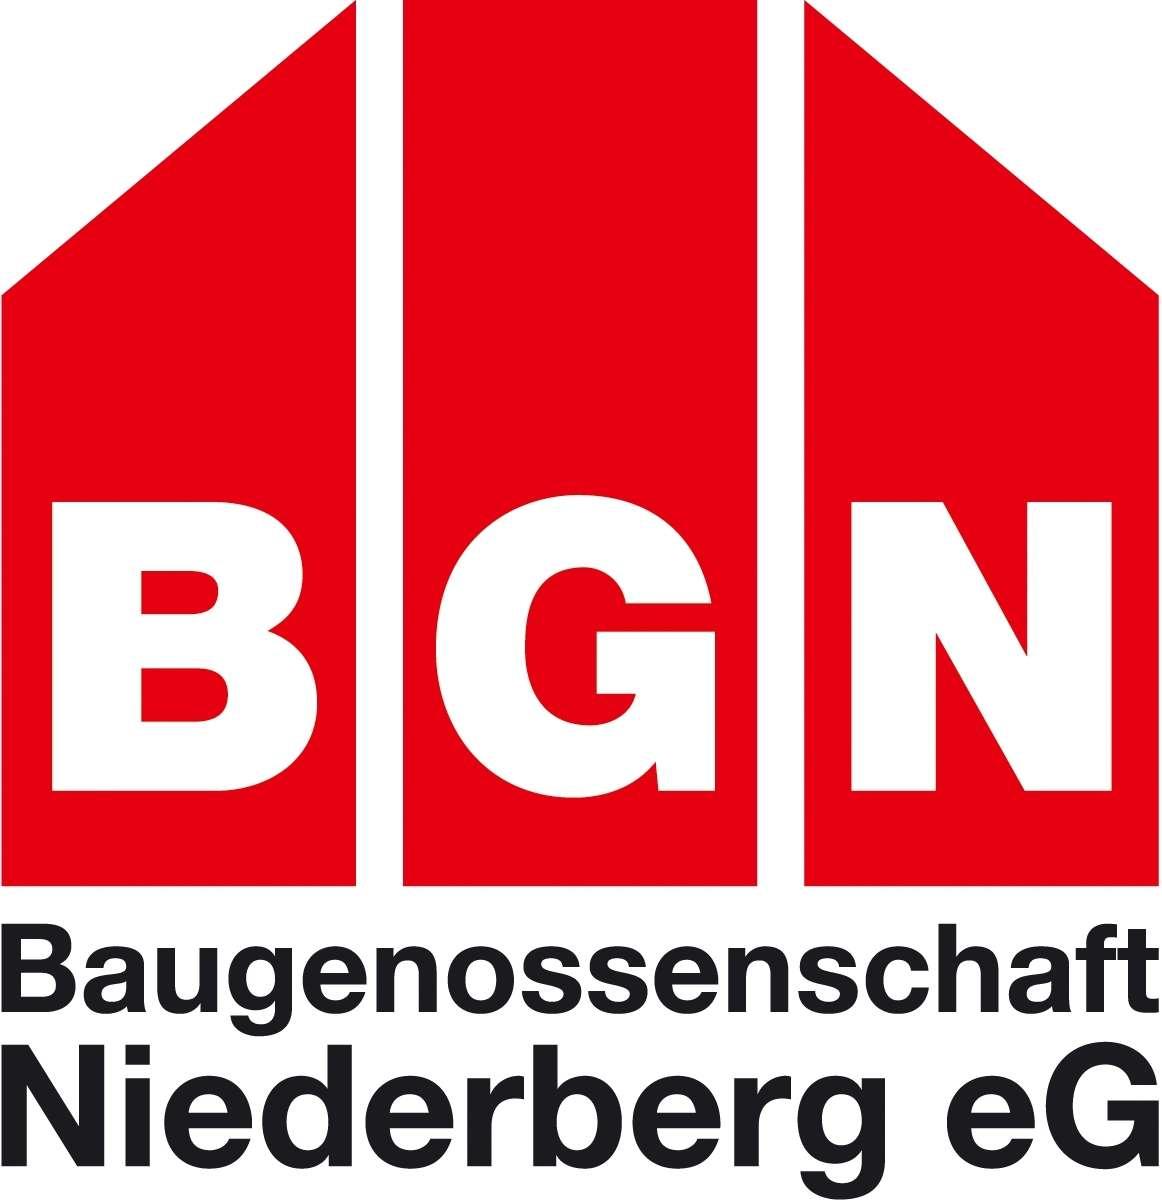 Baugenossenschaft Niederberg eG